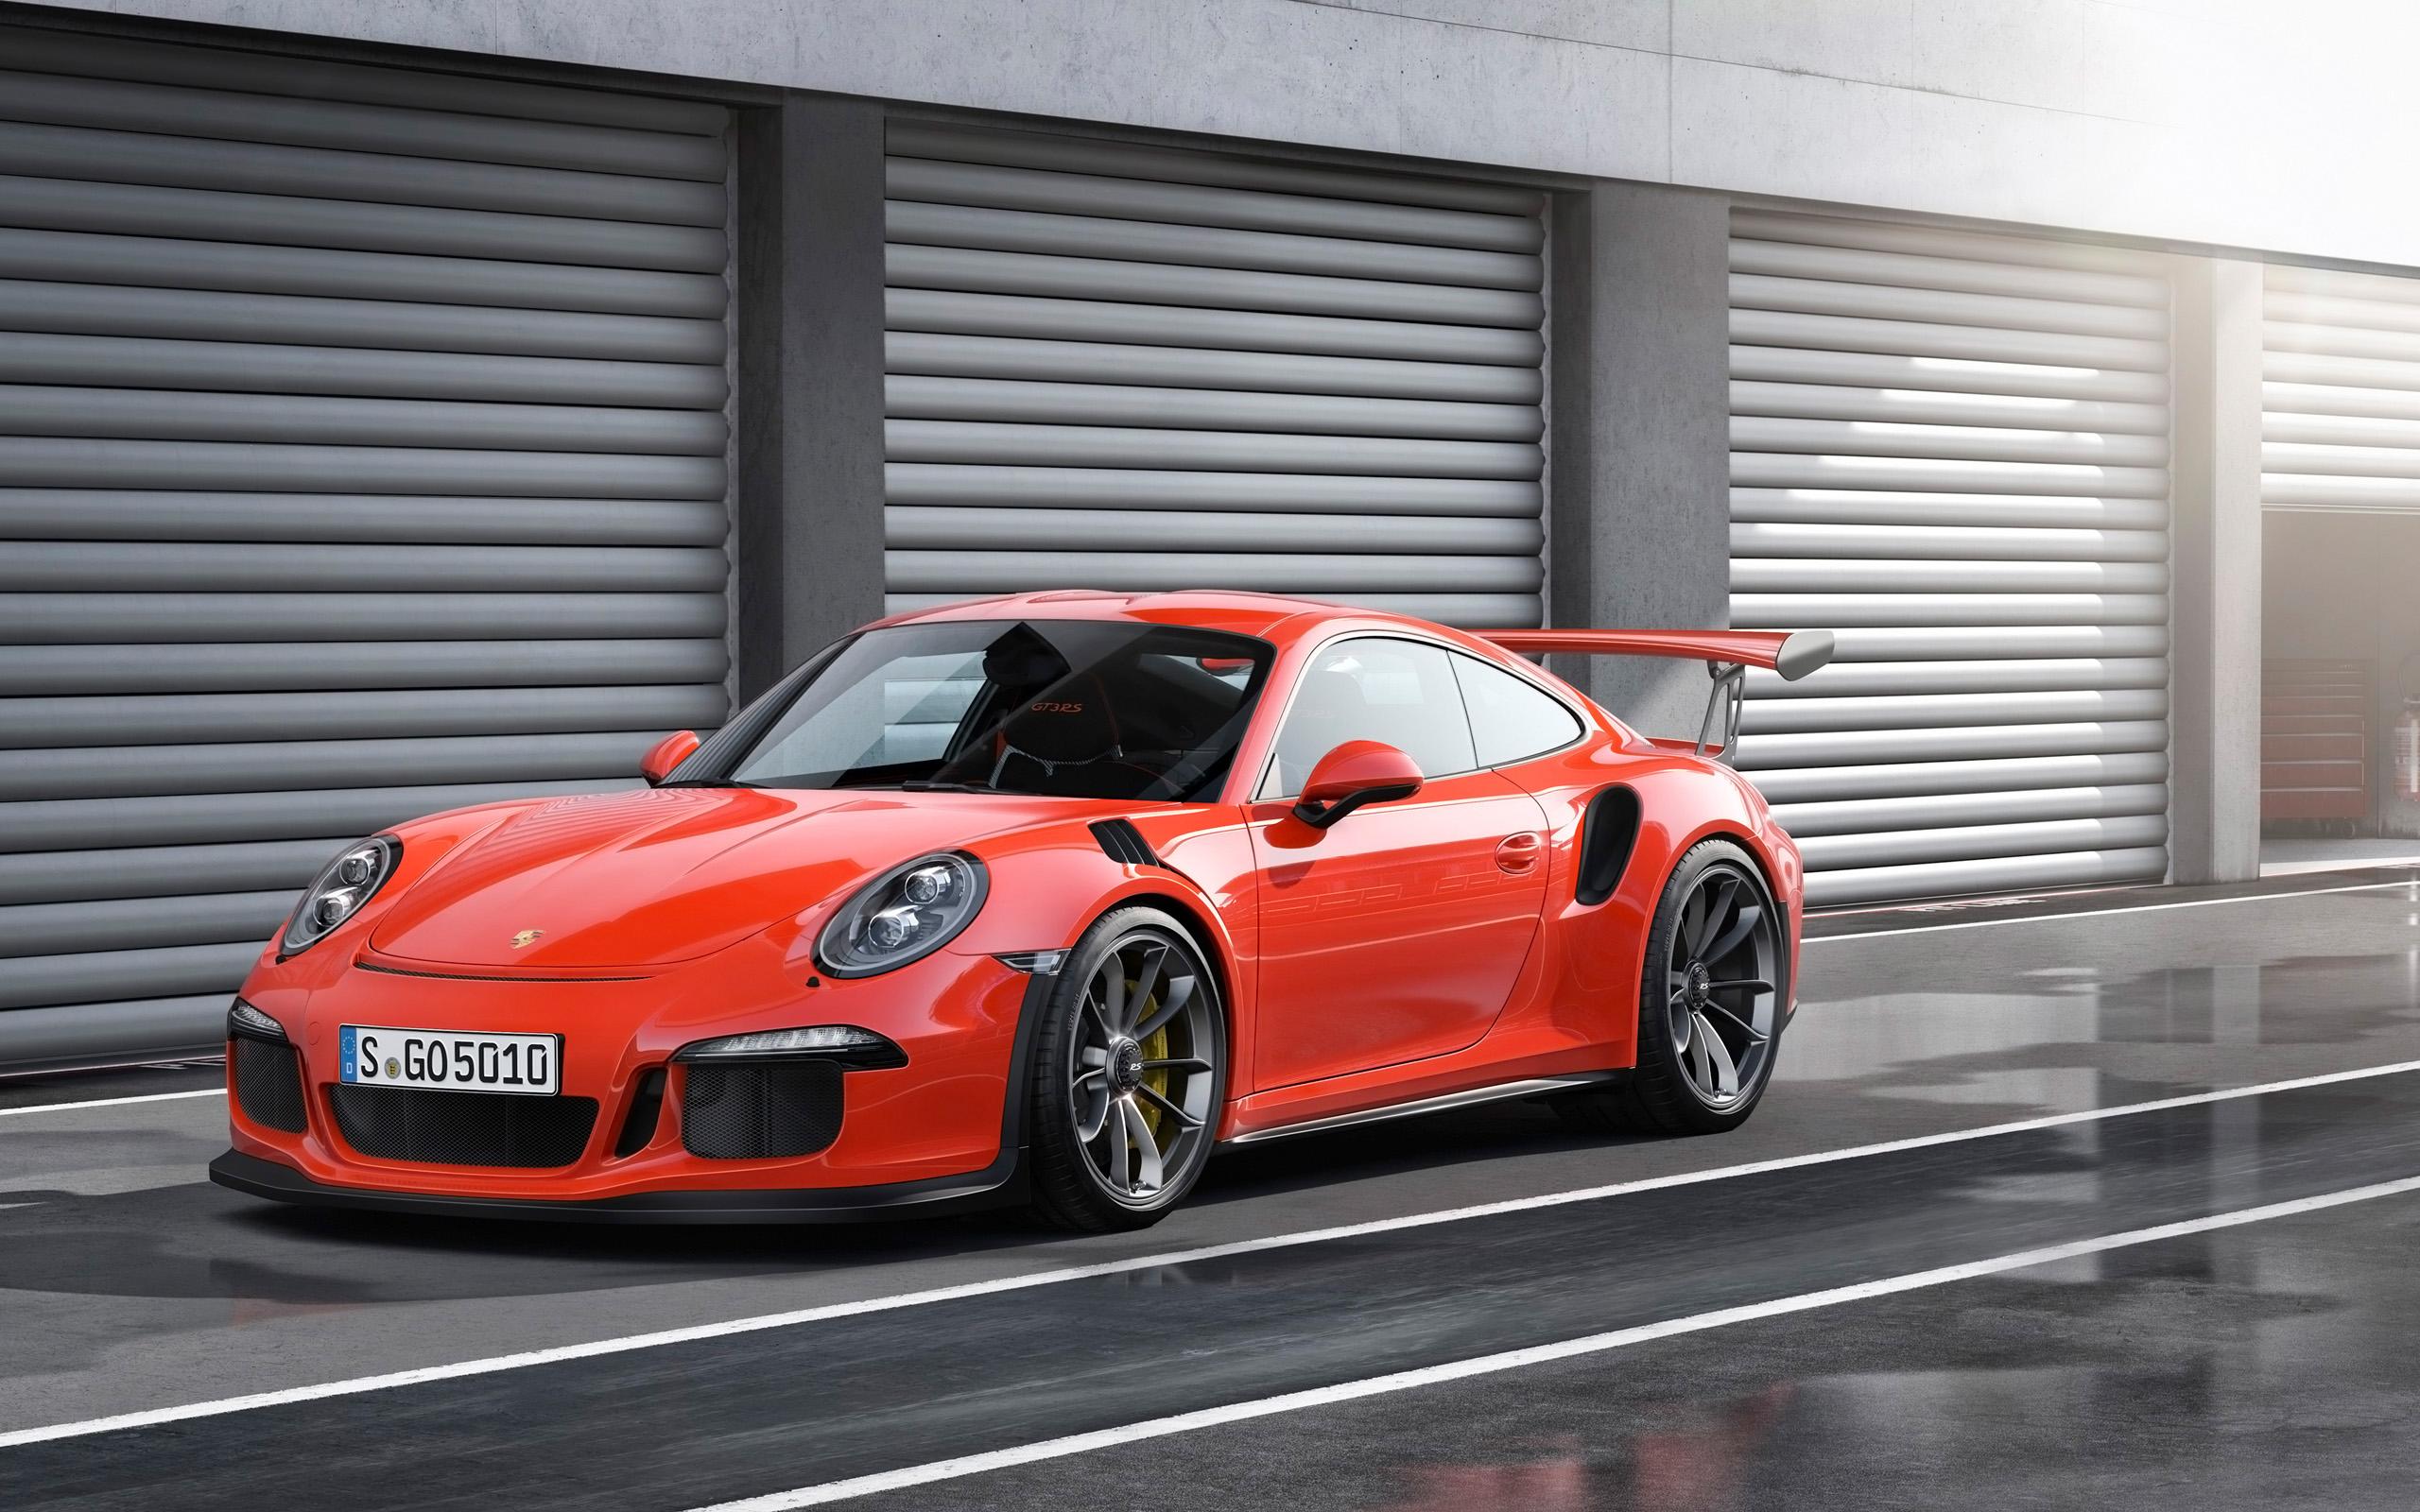 2015 Porsche 911 GT3 RS Wallpapers HD Wallpapers